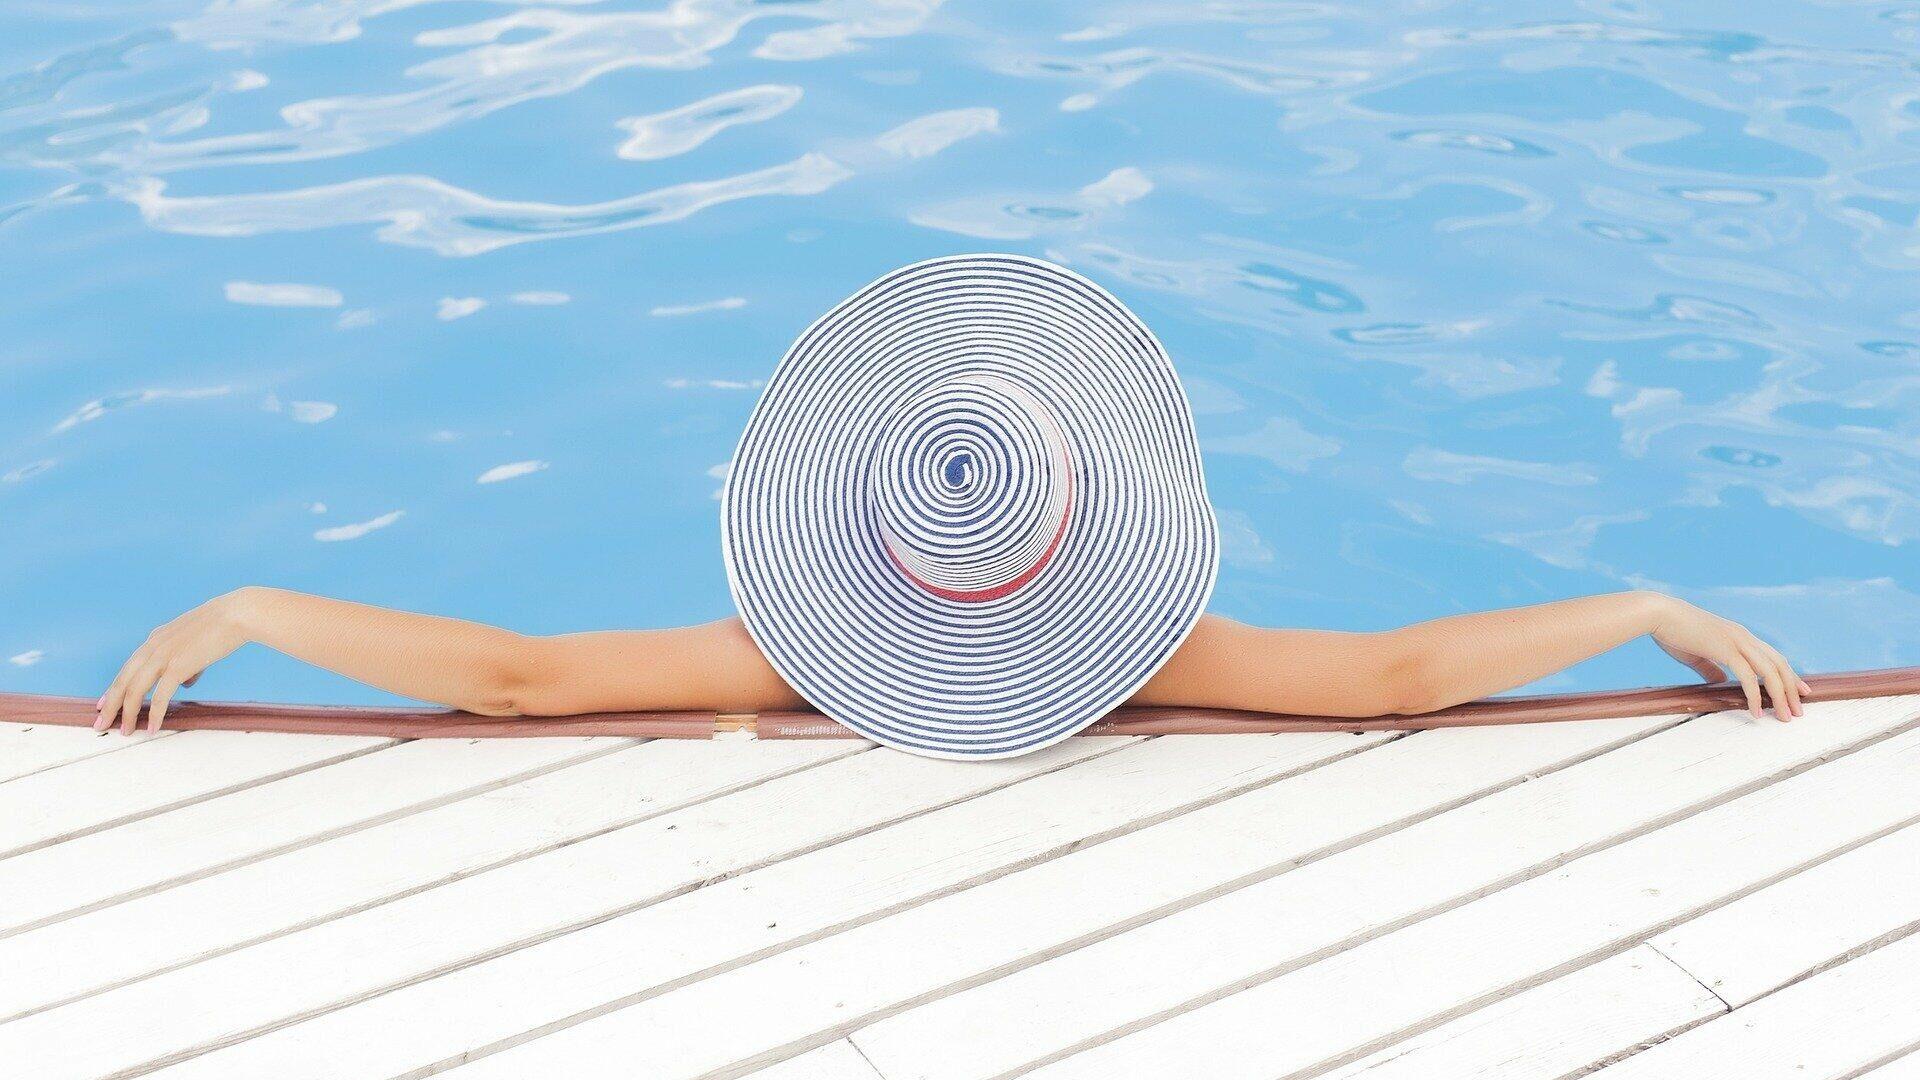 Frau im Schwimmbad (Symbolbild) - SNA, 1920, 02.09.2021